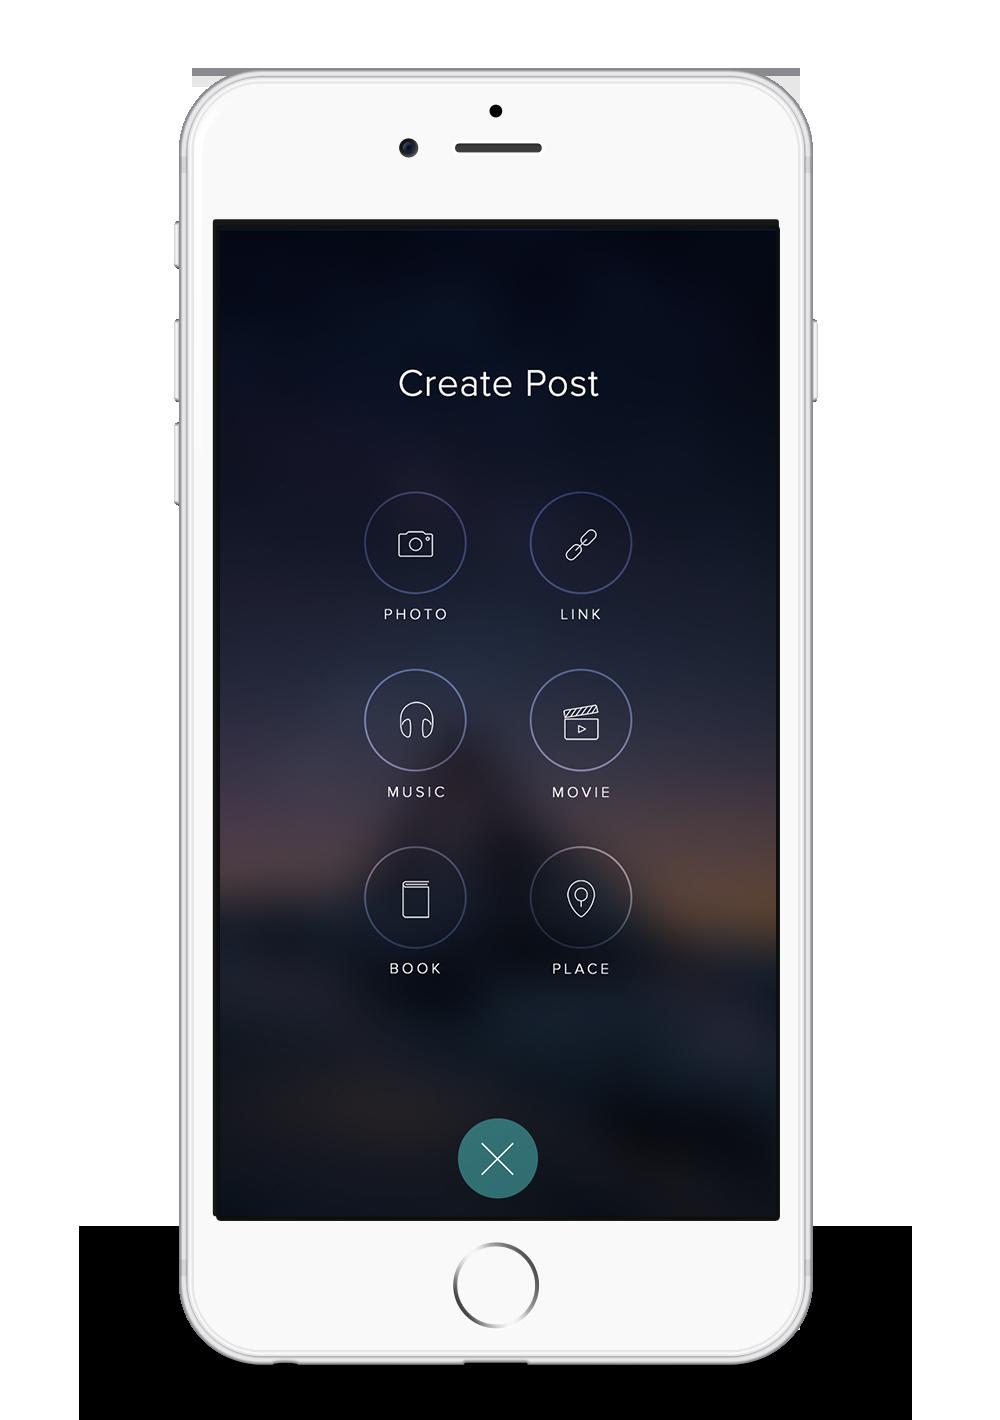 https://static1.squarespace.com/static/53fc5e65e4b075de3ef740ac/t/55b7cdbee4b0112b3ed4243b/1438109118652/Vero-iPhone-CreatePost.png